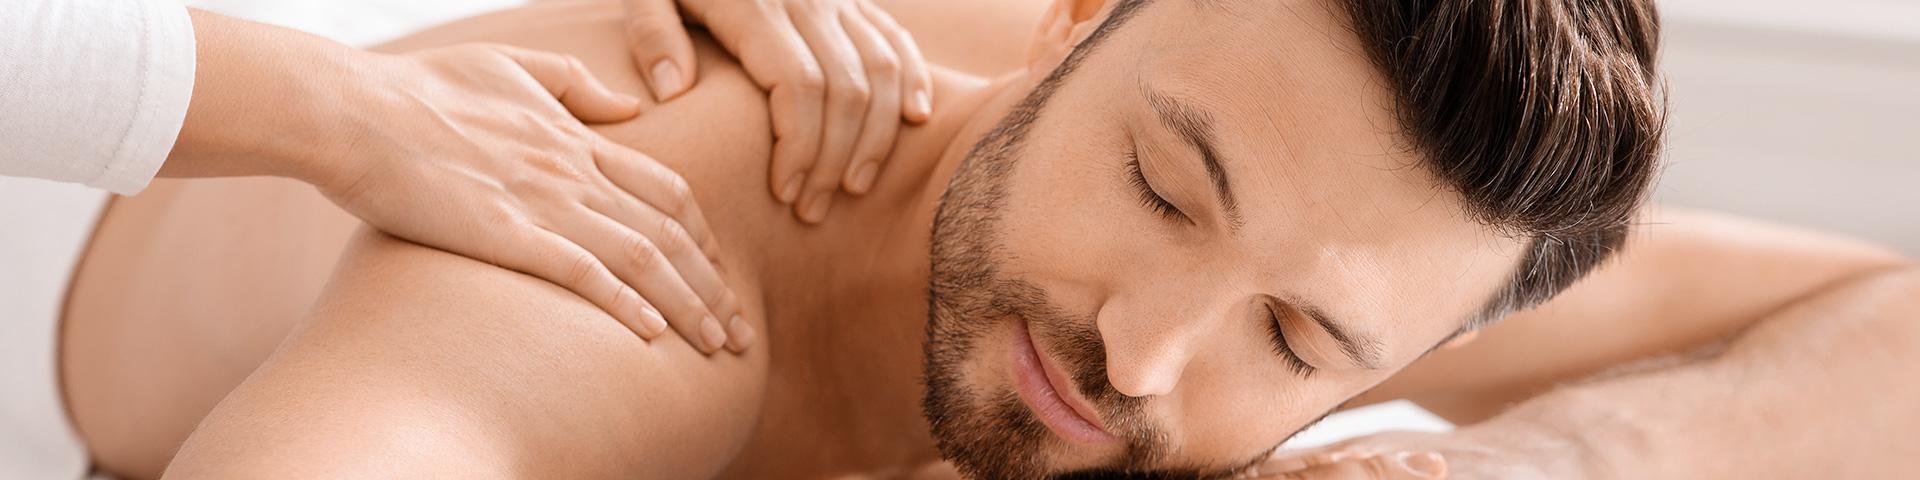 Massage für Männer Junger Mann mit Bart liegt entspannt am Bauch. Er wird an der Schulter massiert